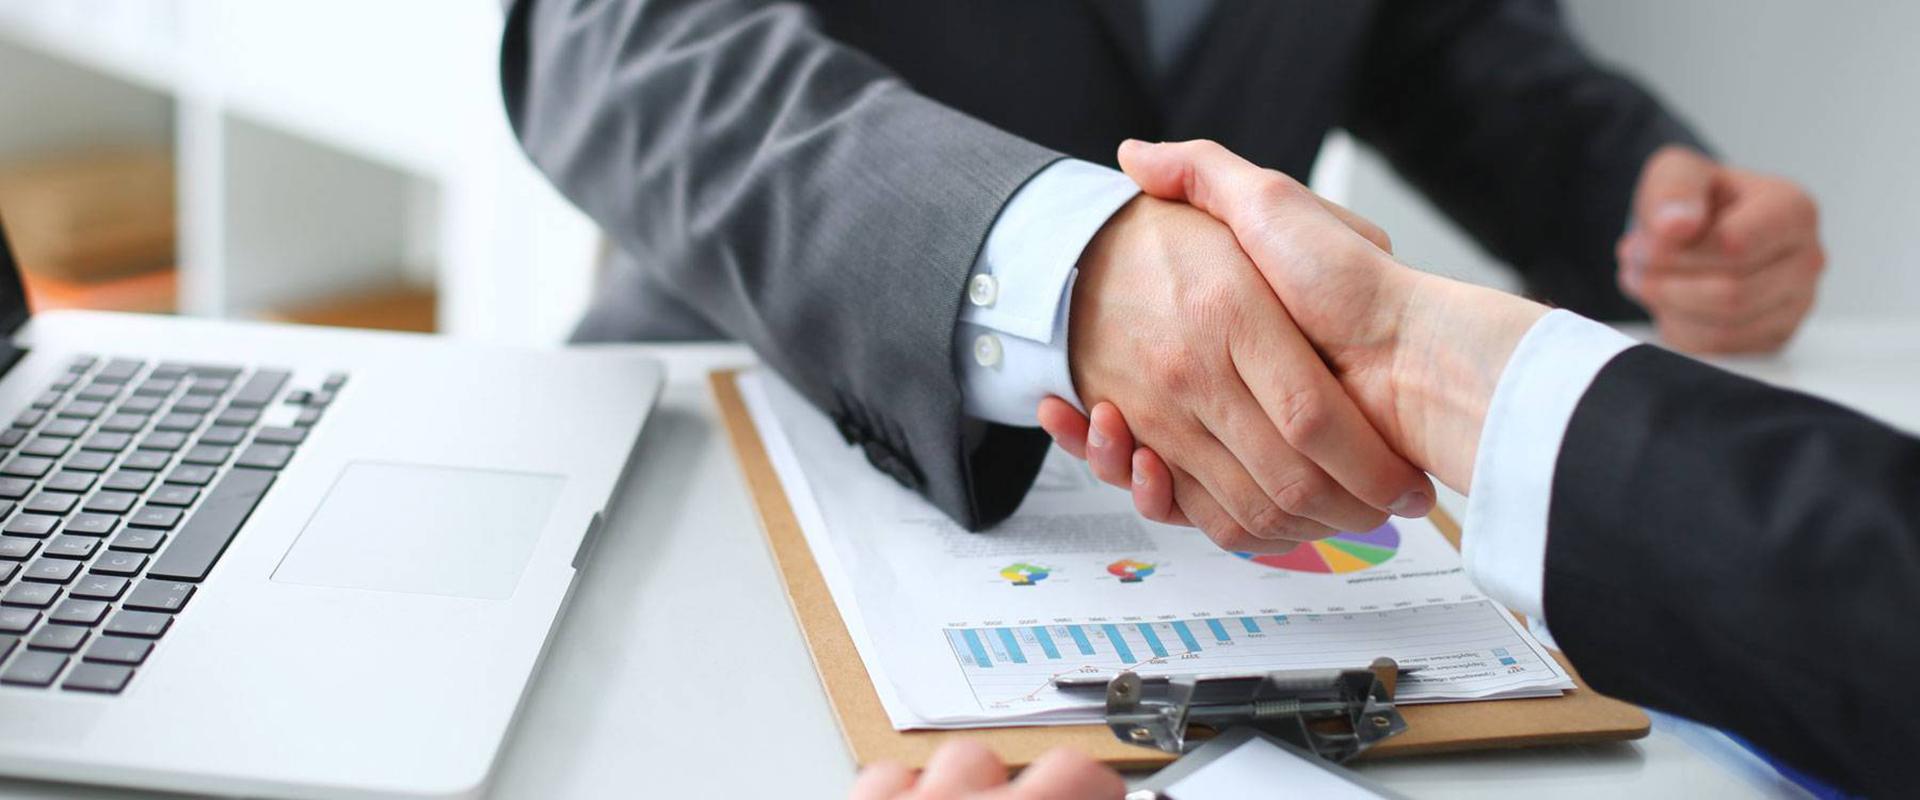 Business-Loan-Web-Stock-1920px@24-03-2020-151955